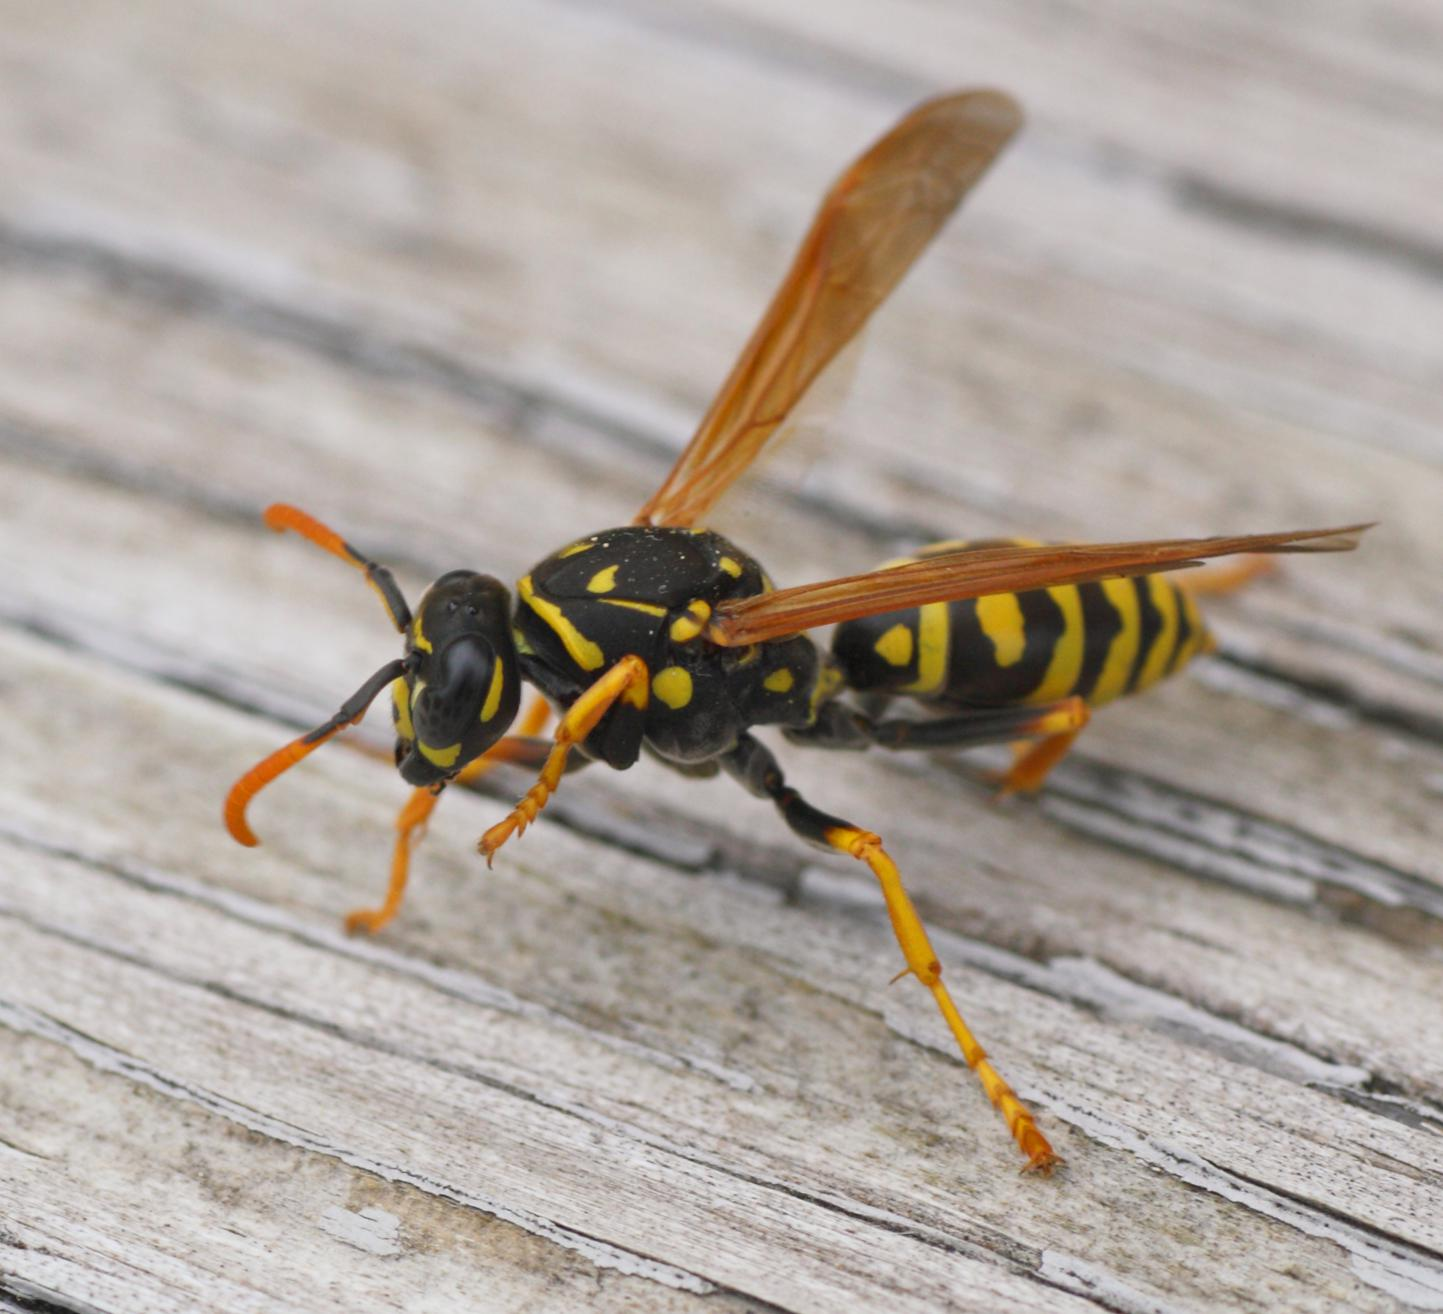 black bees sting